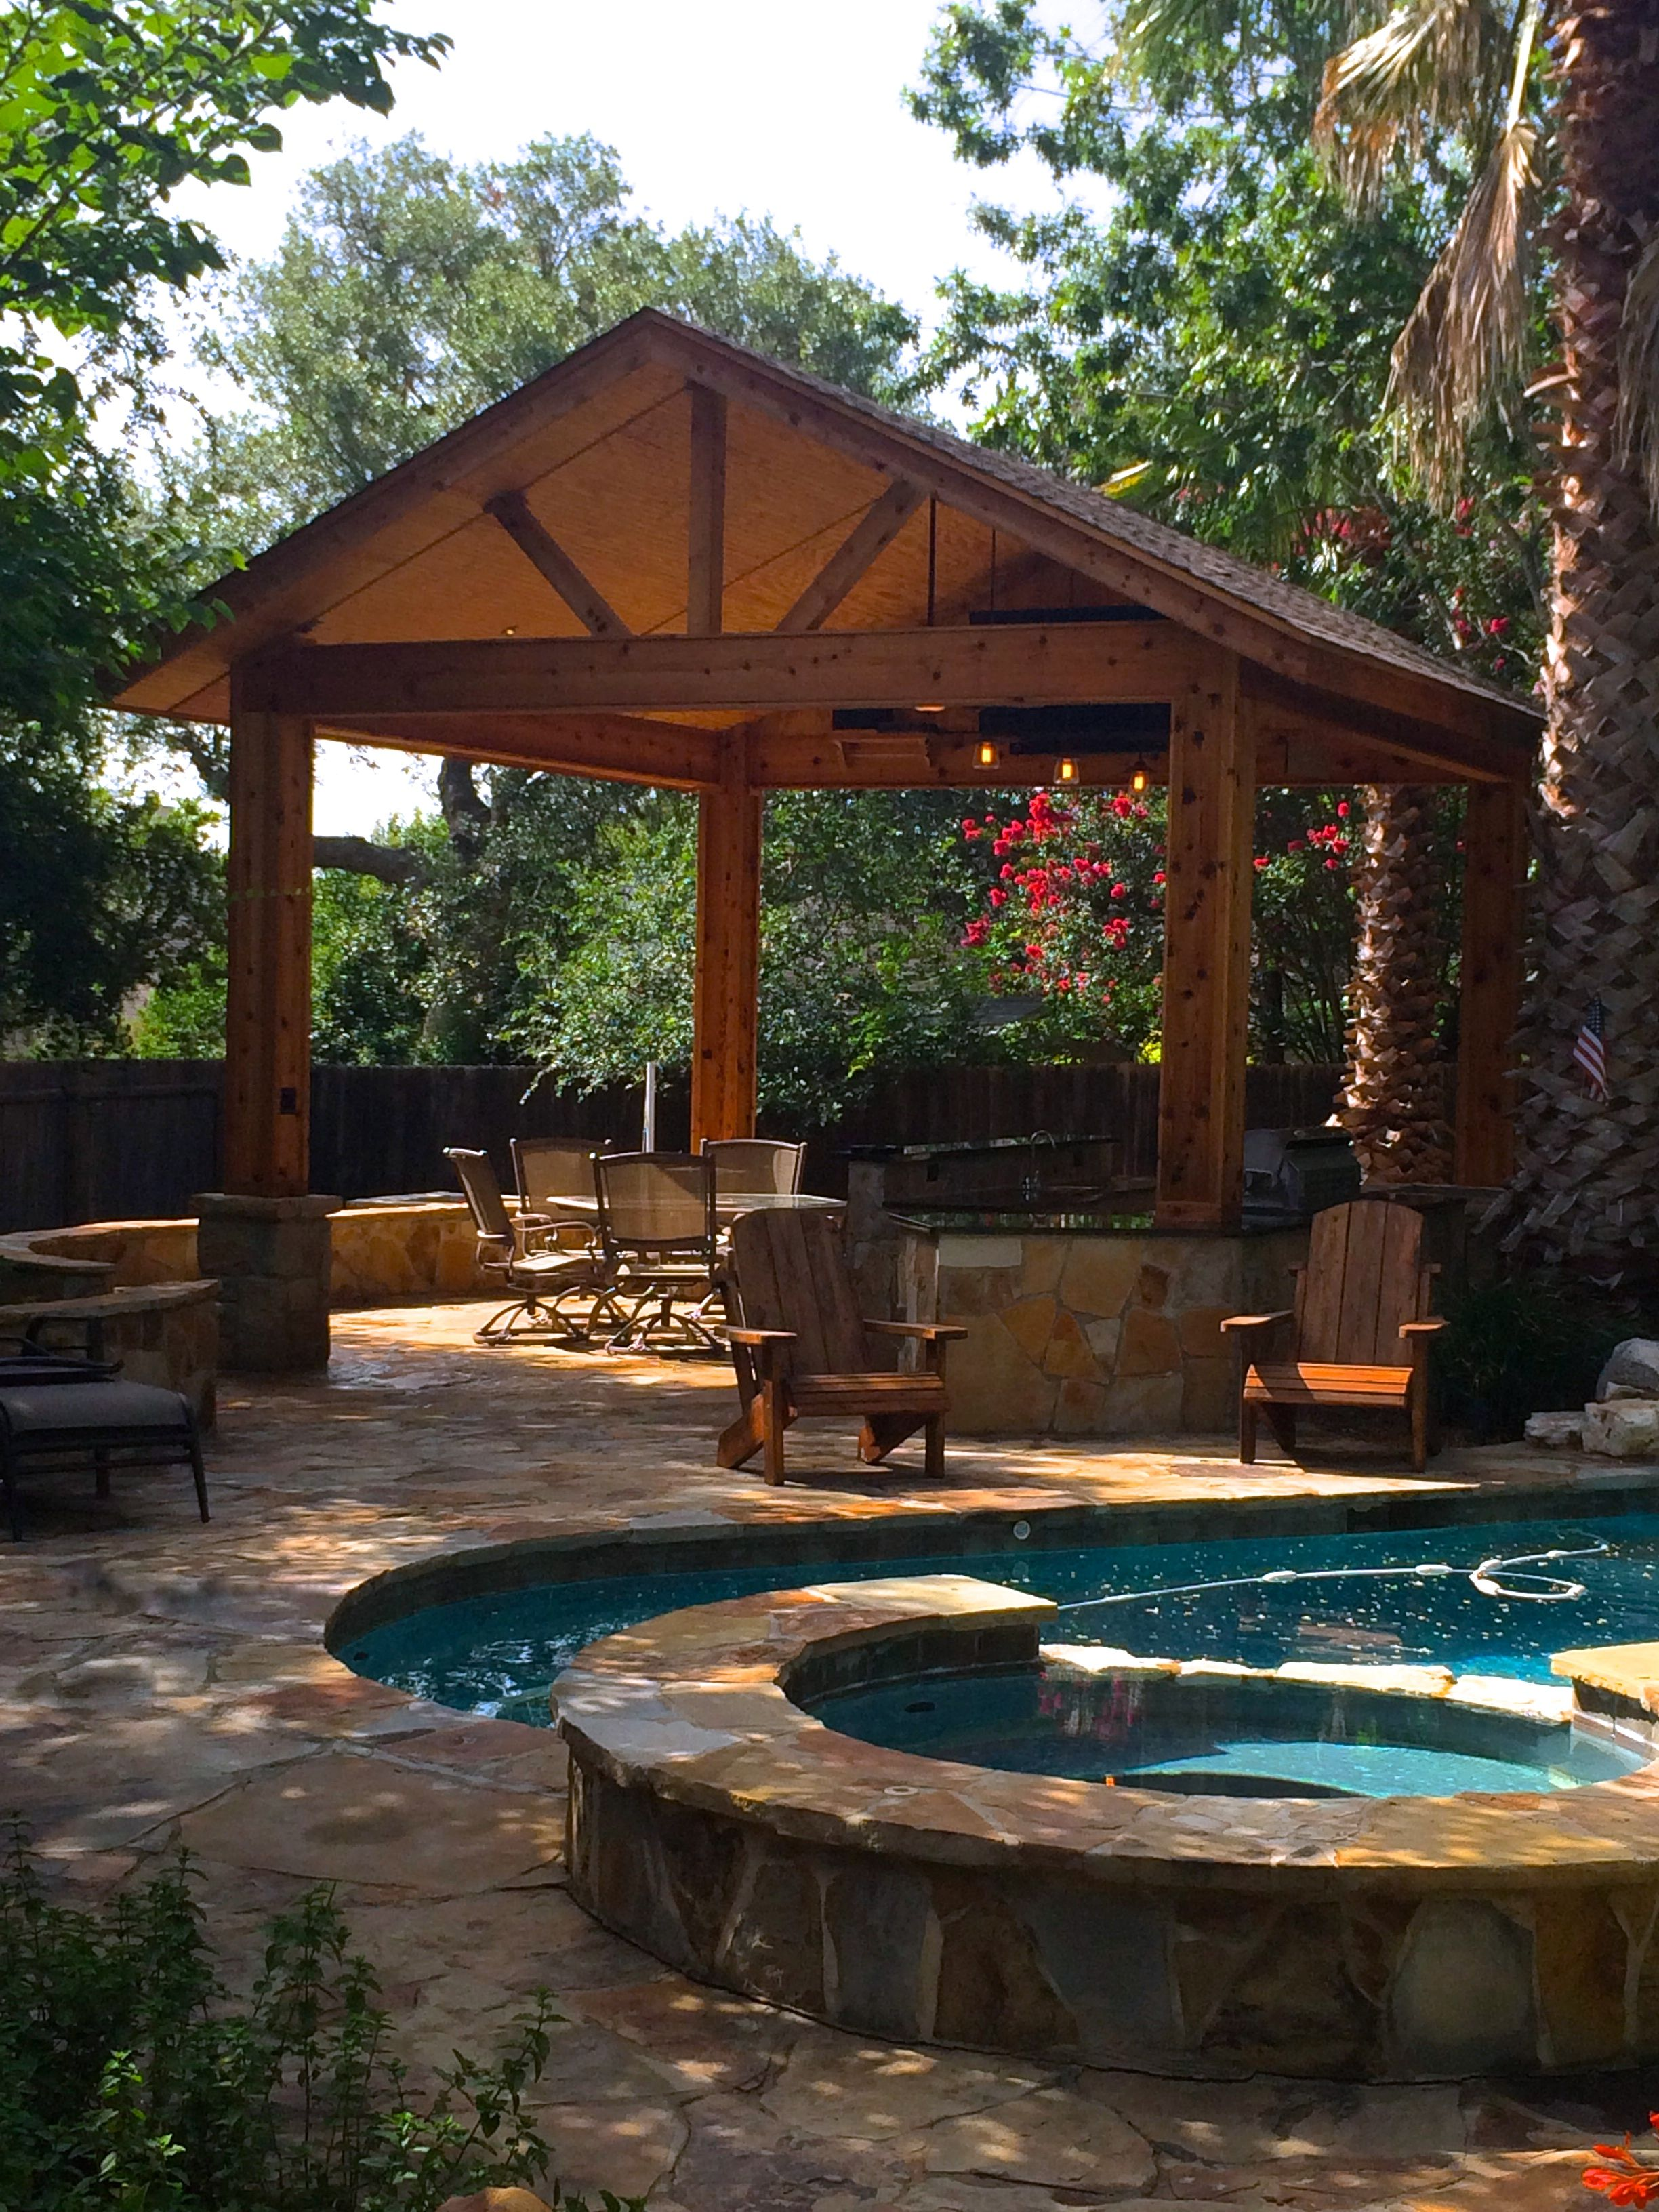 San Antonio Patio And Custom Pool Cabana With Outdoor Kitchen Arquitectura